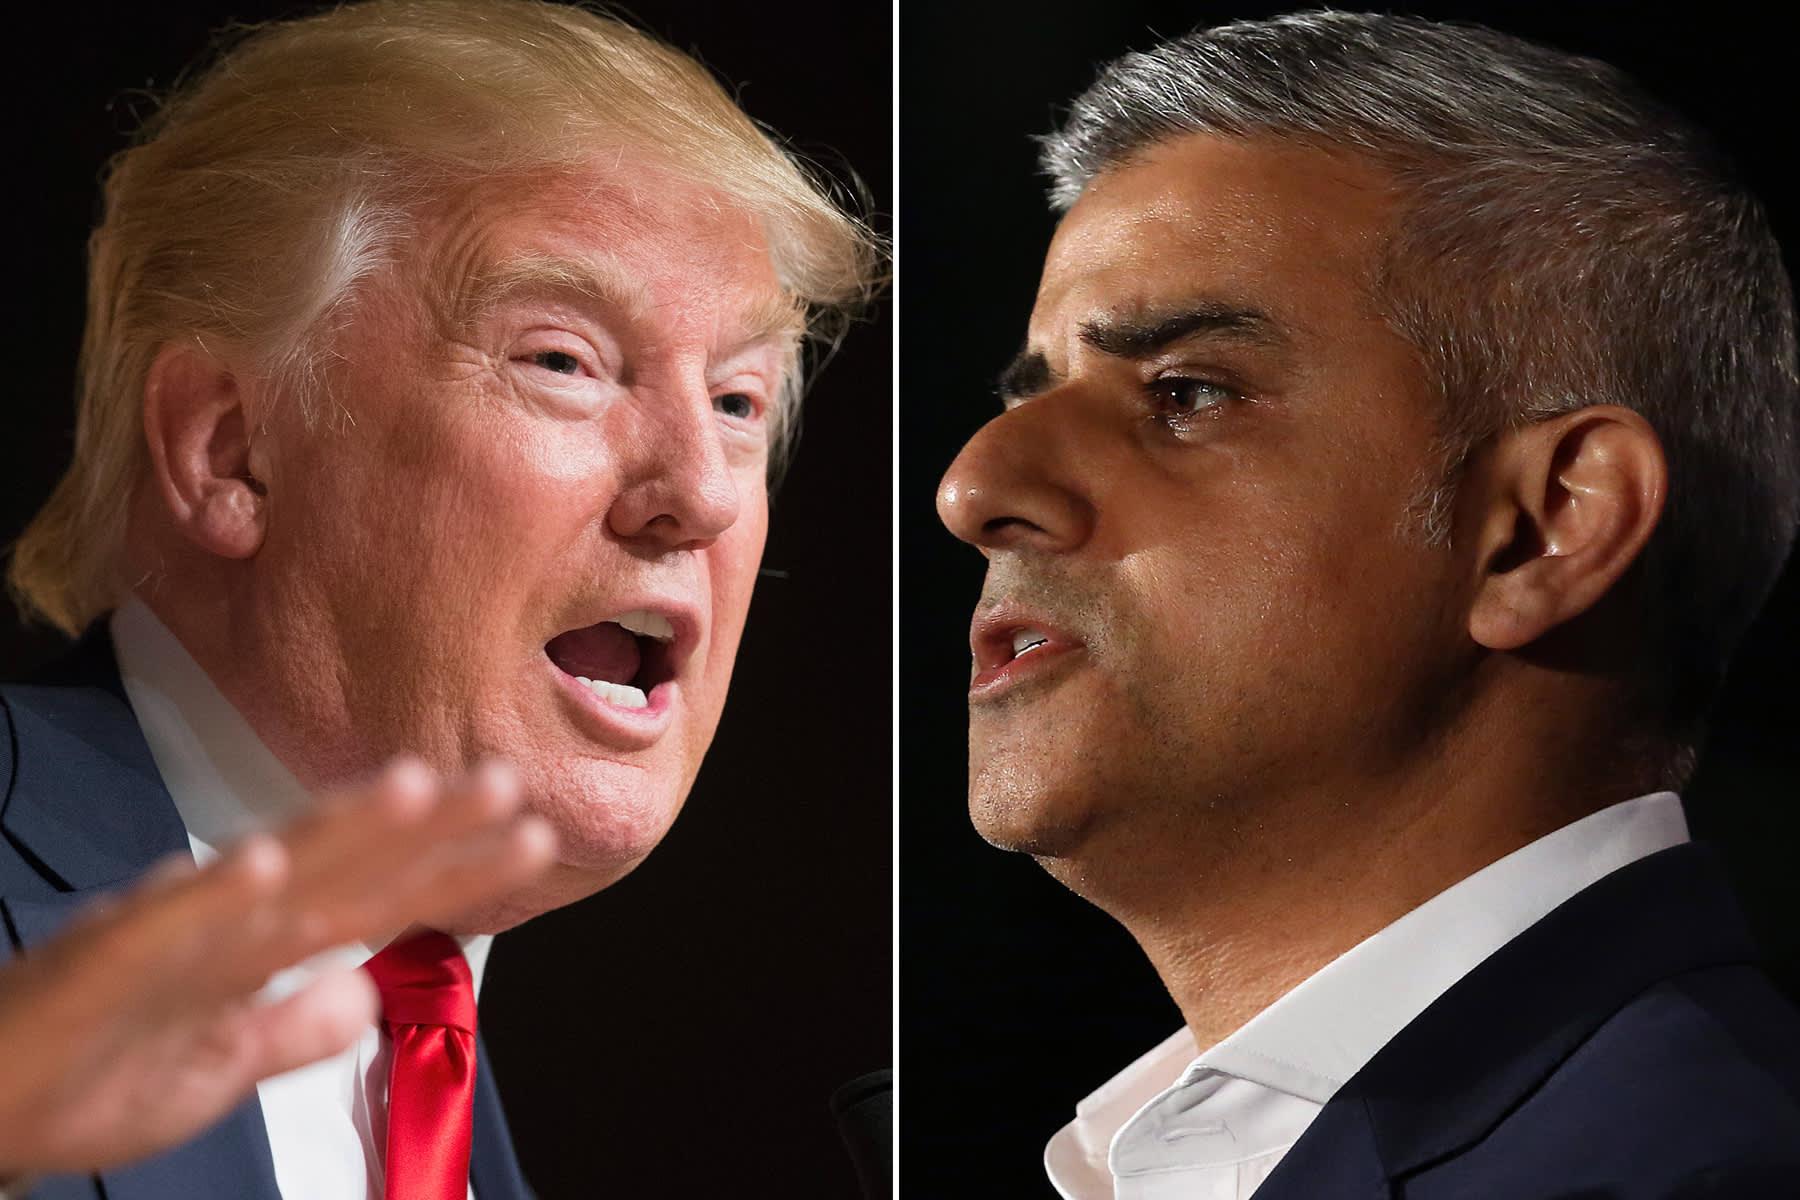 Trump blasts London Mayor Sadiq Khan on UK trip: 'He is a stone cold loser'